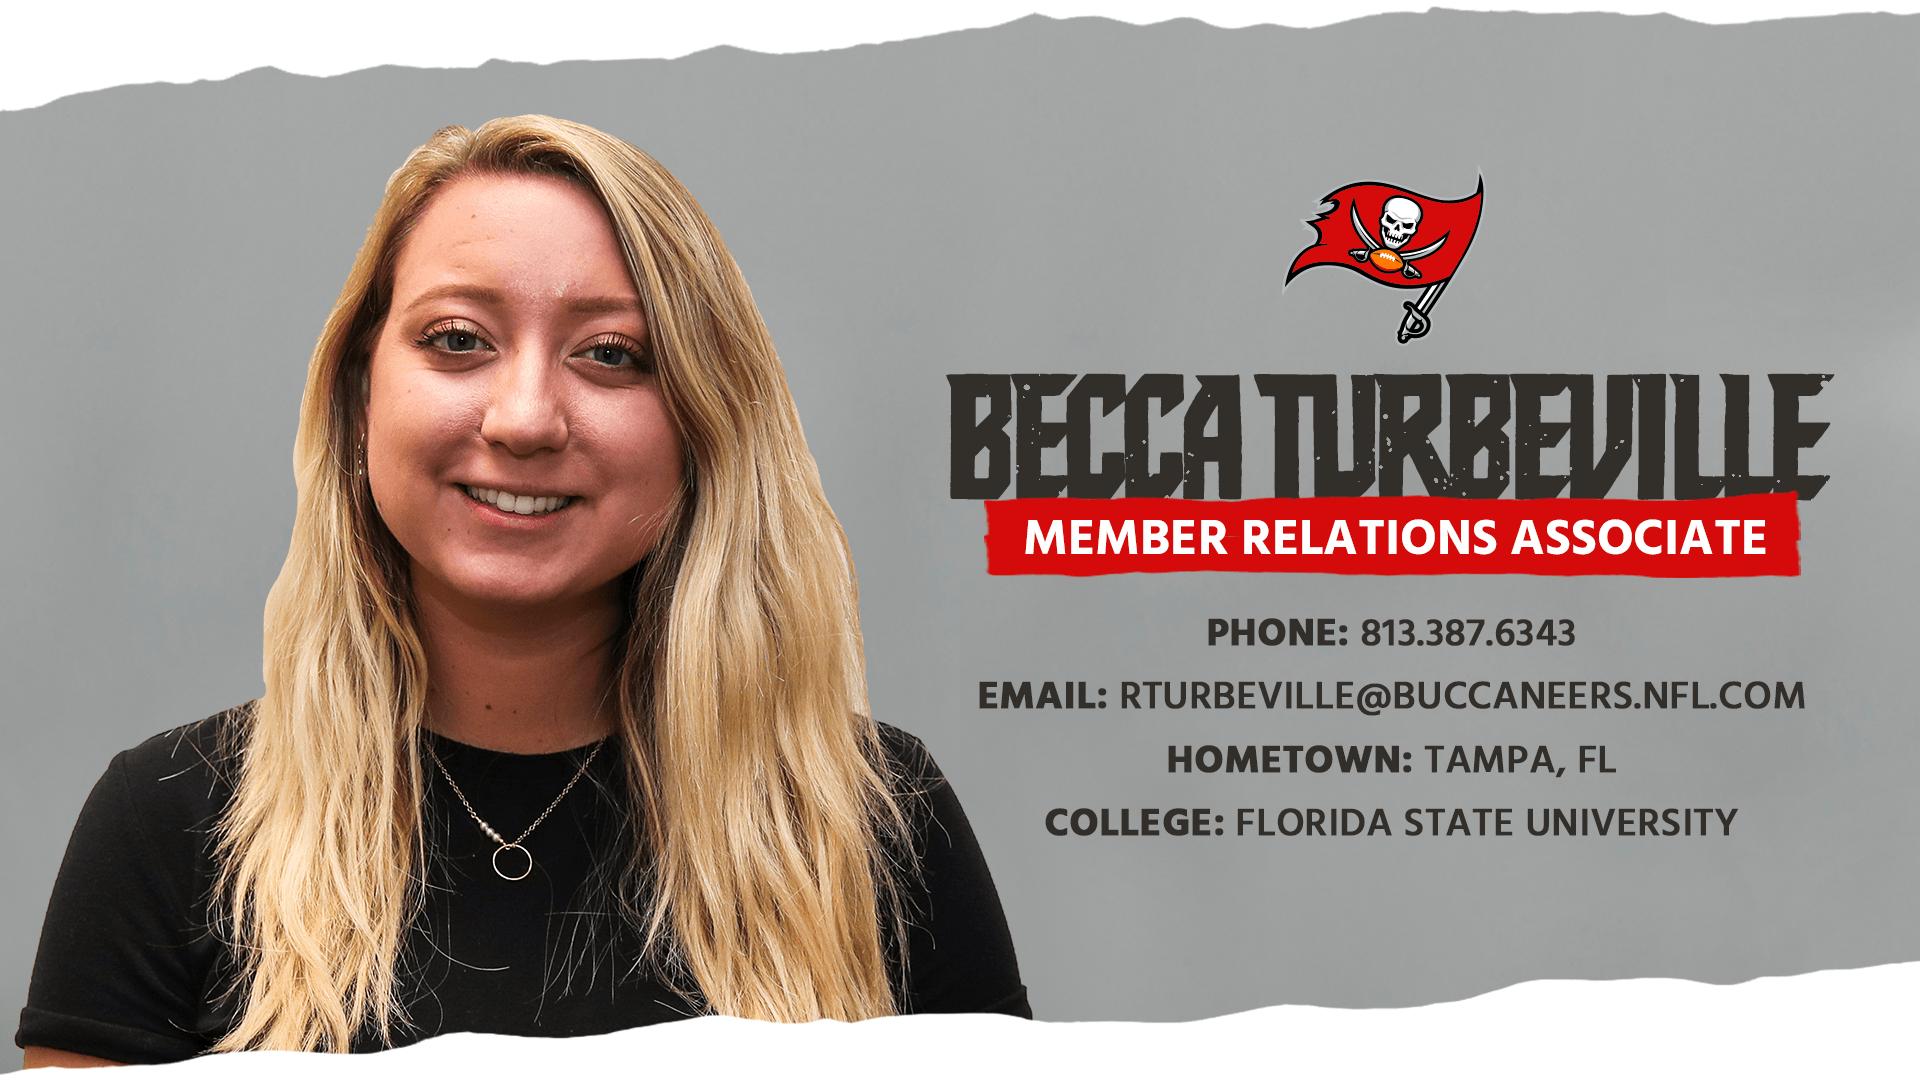 Becca Turbeville